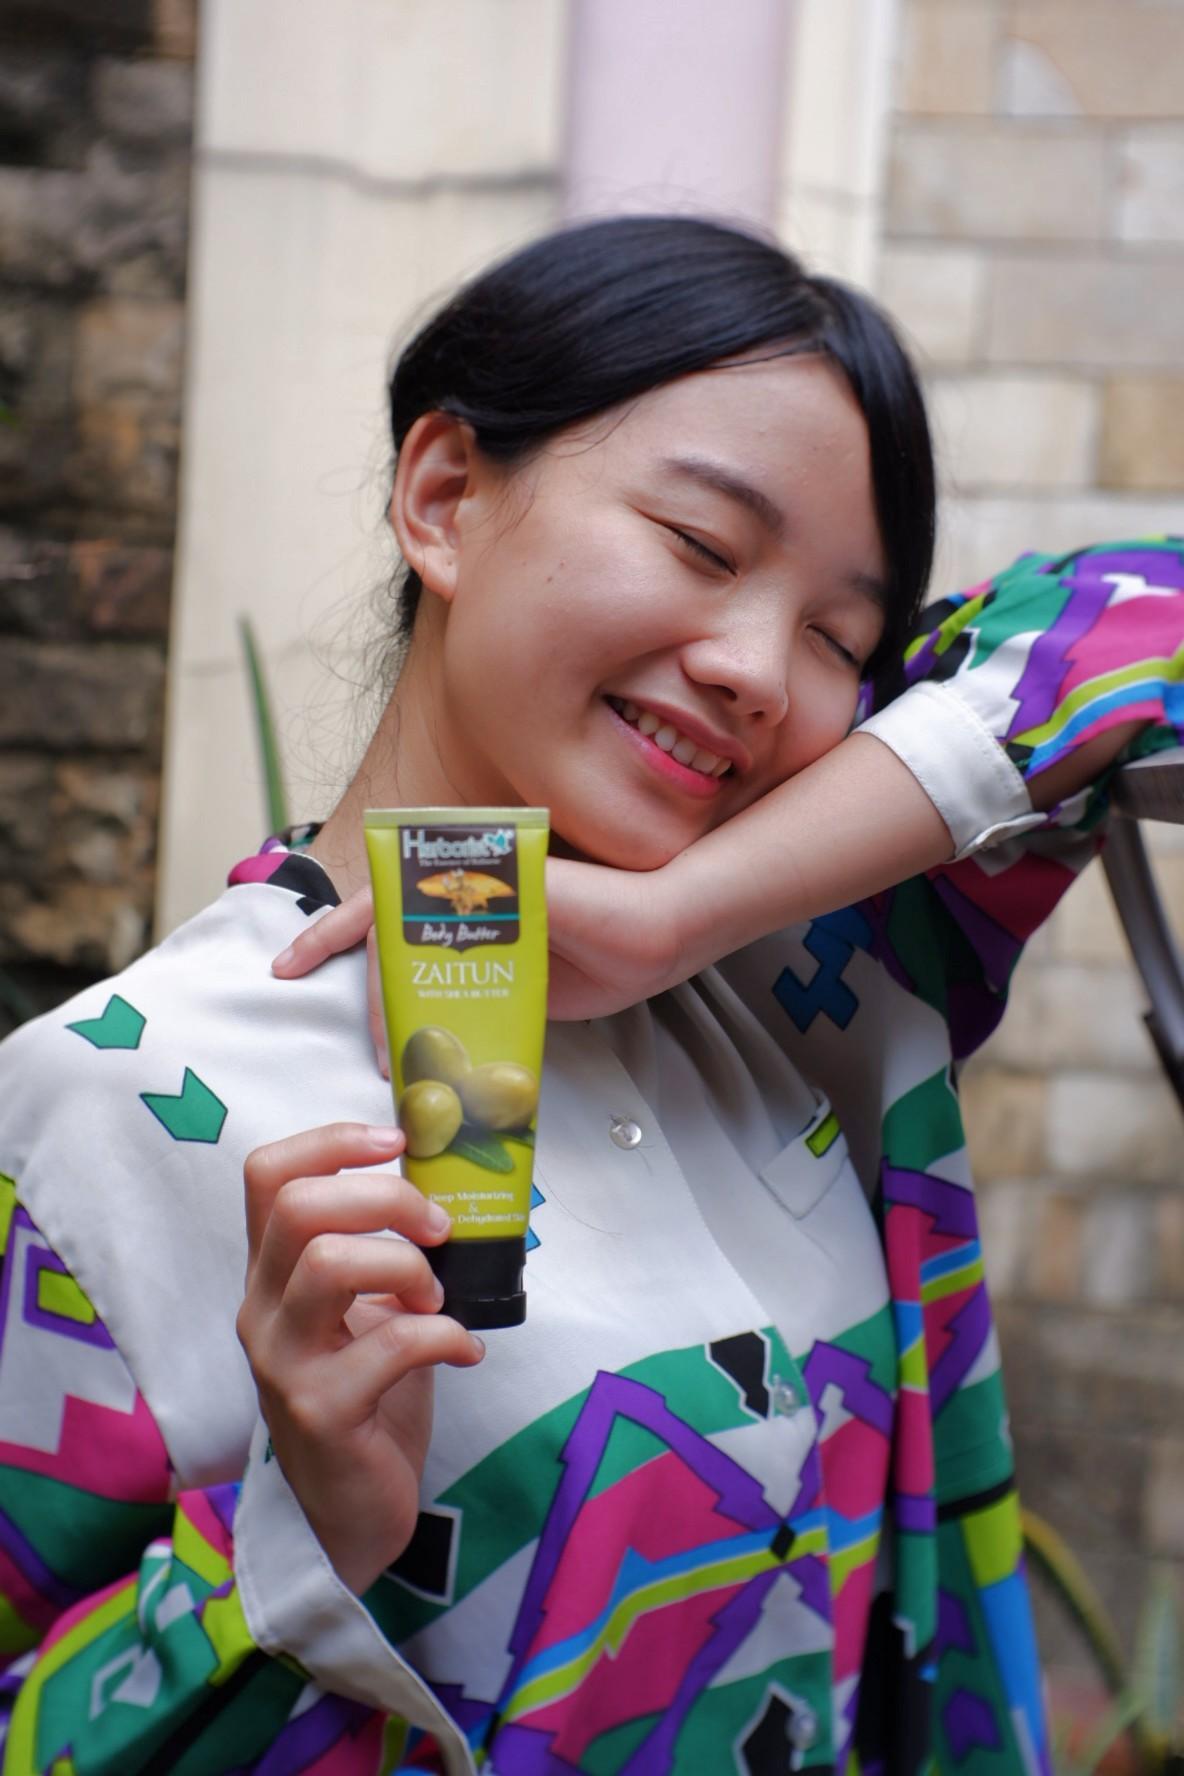 Herborist Body Butter Zaitun #Bapau